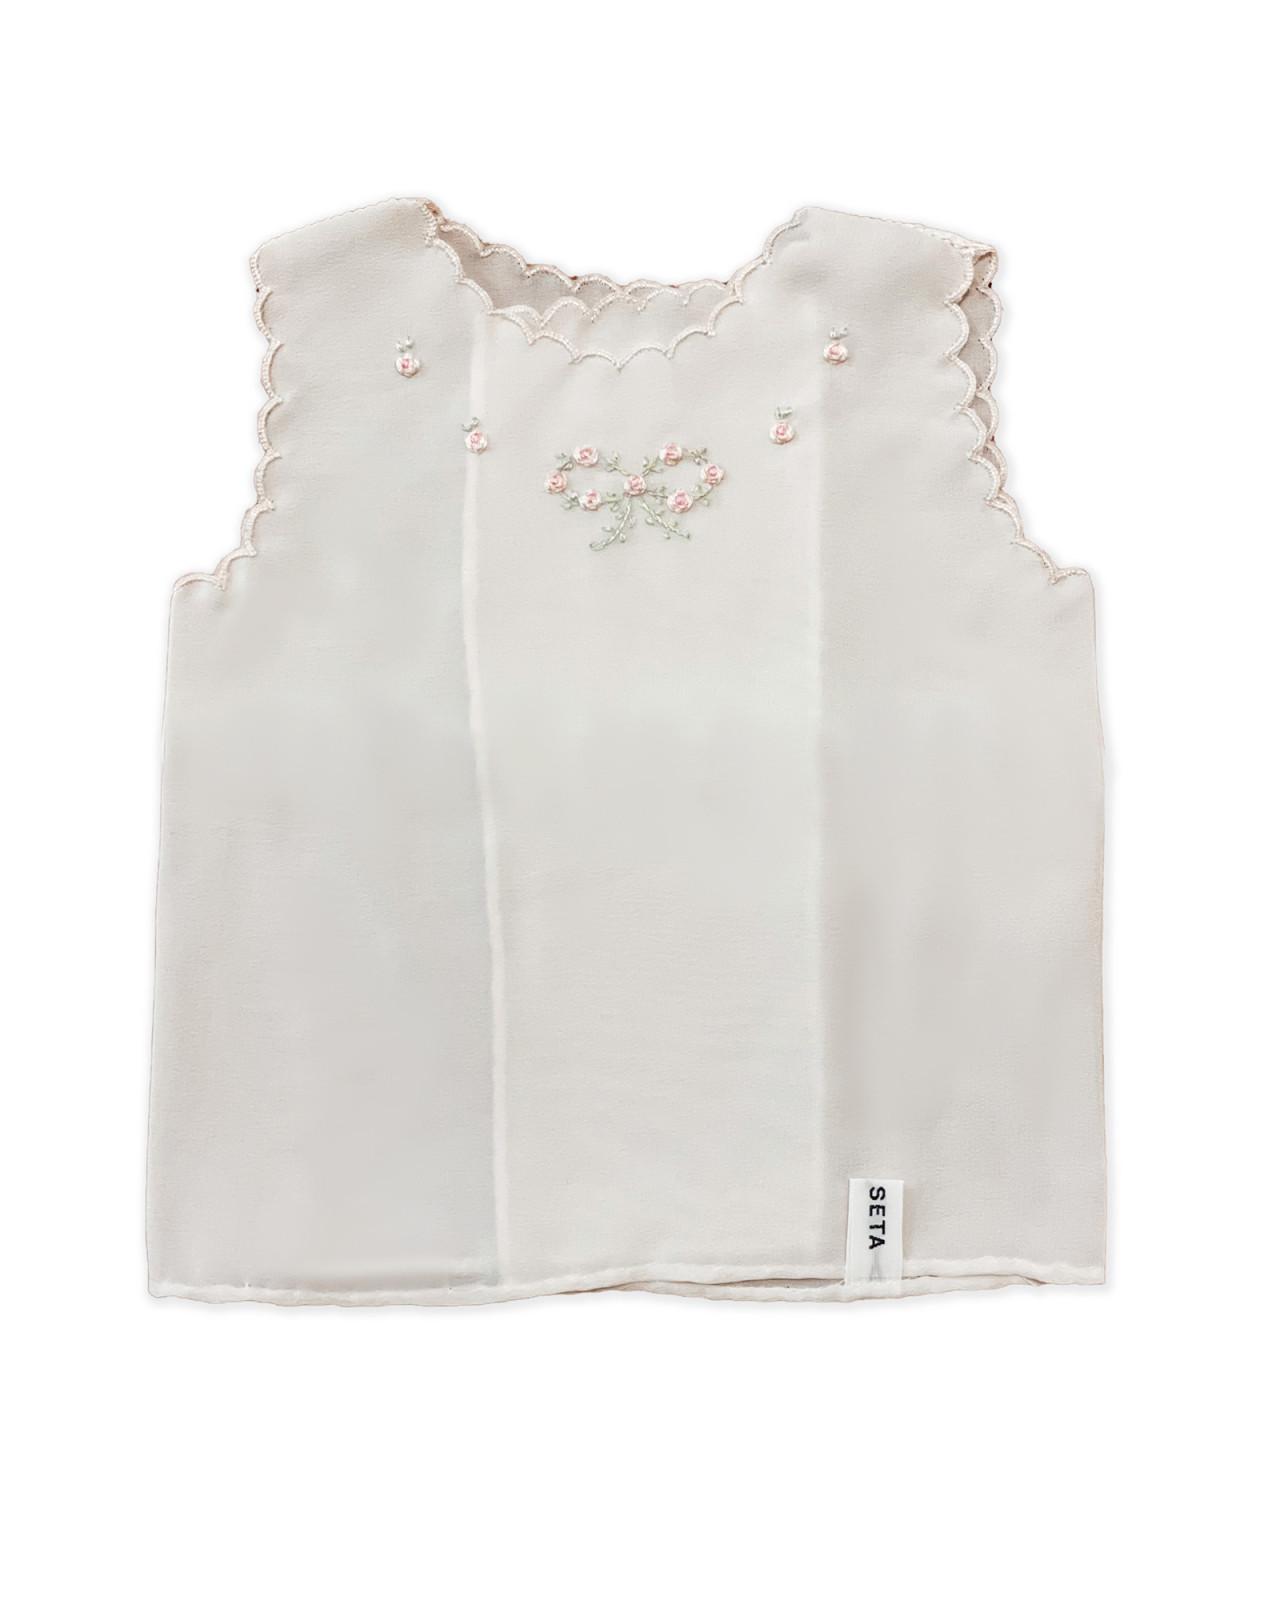 Baby LUCK shirt hand made